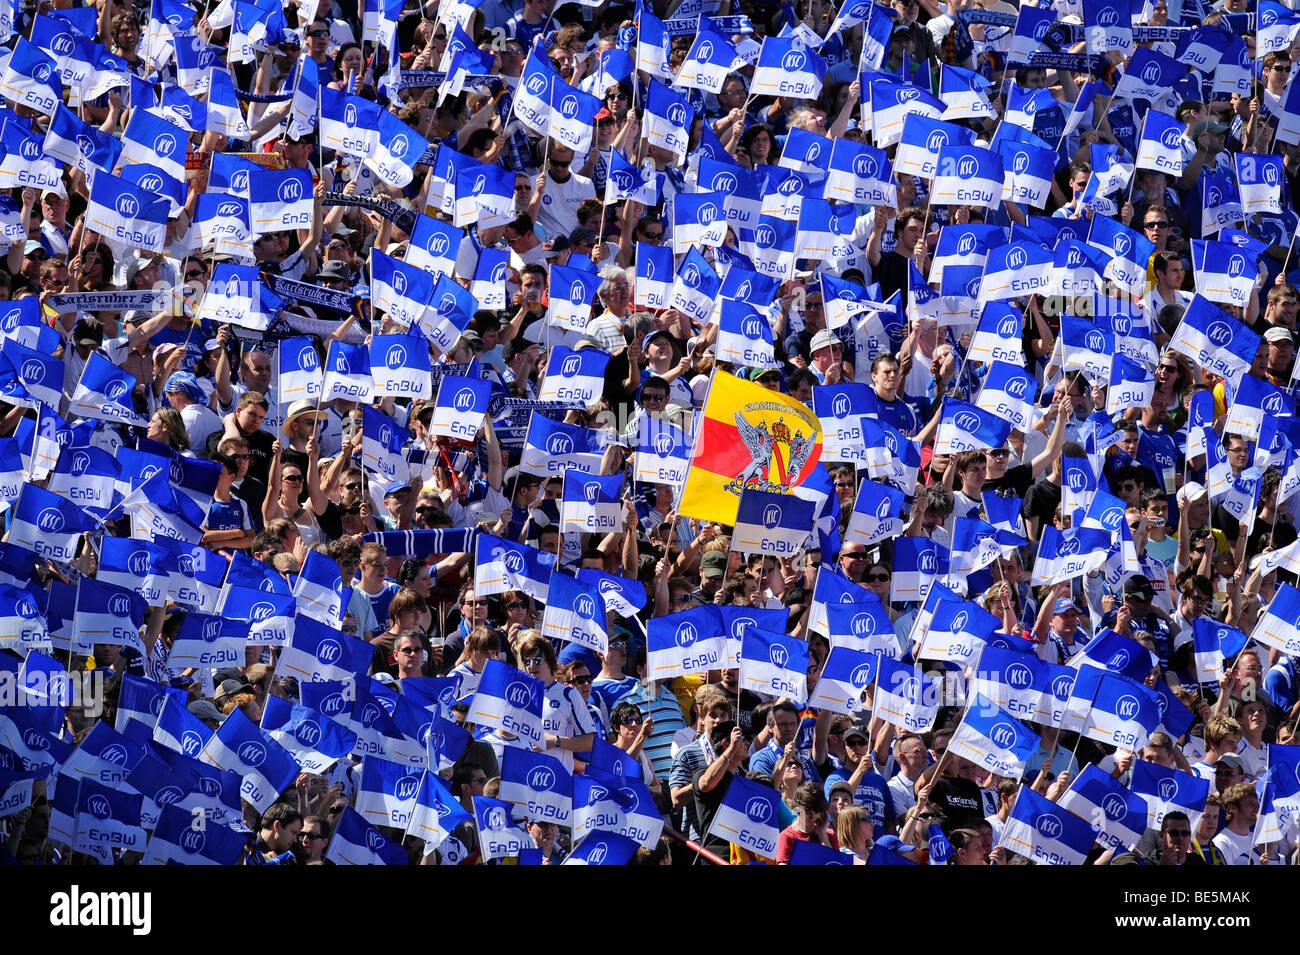 Karlsruher SC fan block with Baden flag, Wildpark Stadium Karlsruhe, Baden-Wuerttemberg, Germany, Europe Stock Photo